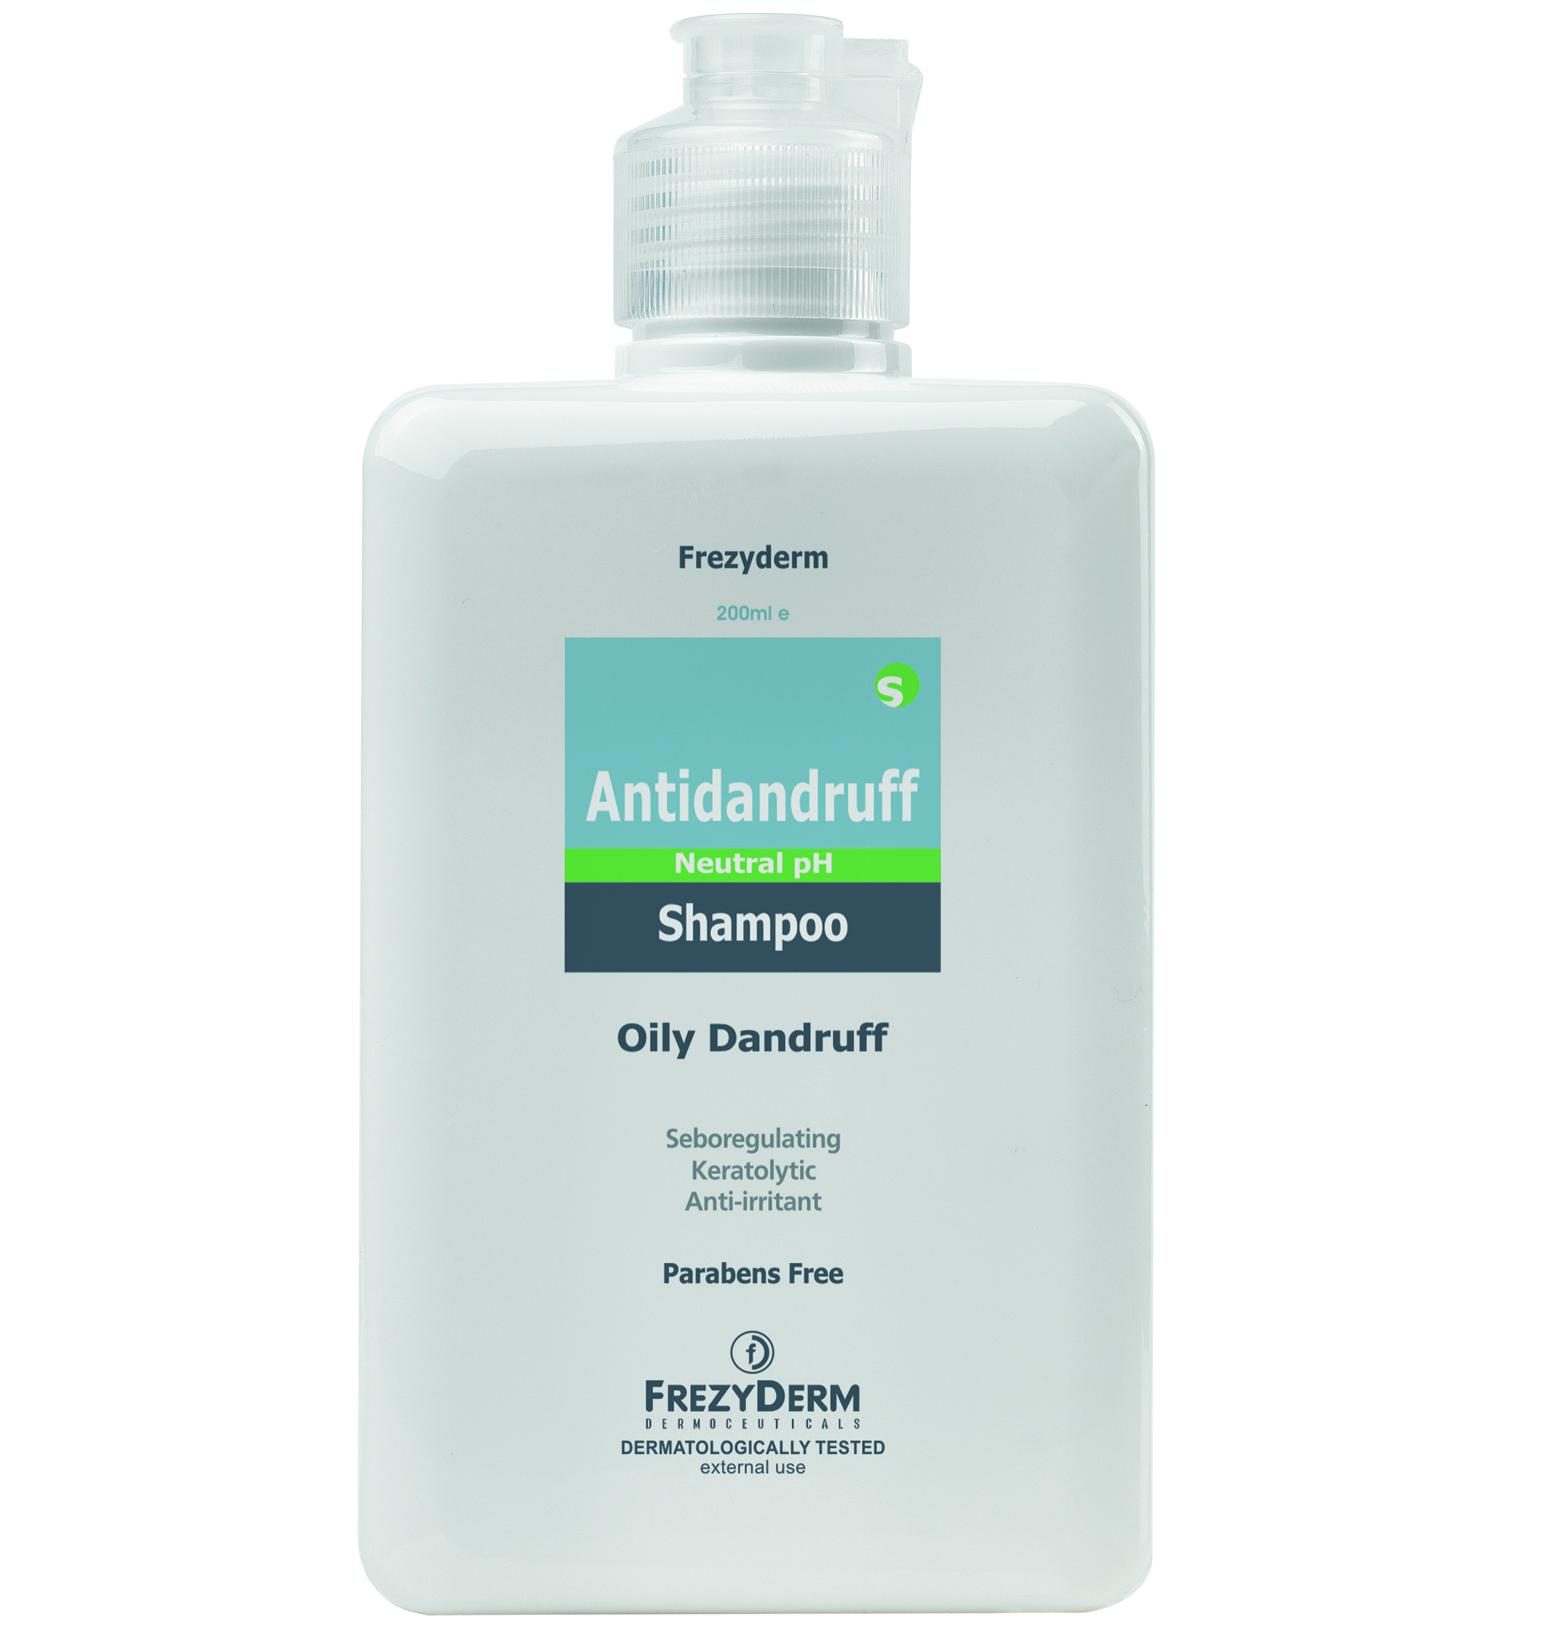 Frezyderm Antidandruff ShampooΣαμπουάν για την Αντιμετώπιση της Λιπαρής Πιτυρίδας 200ml